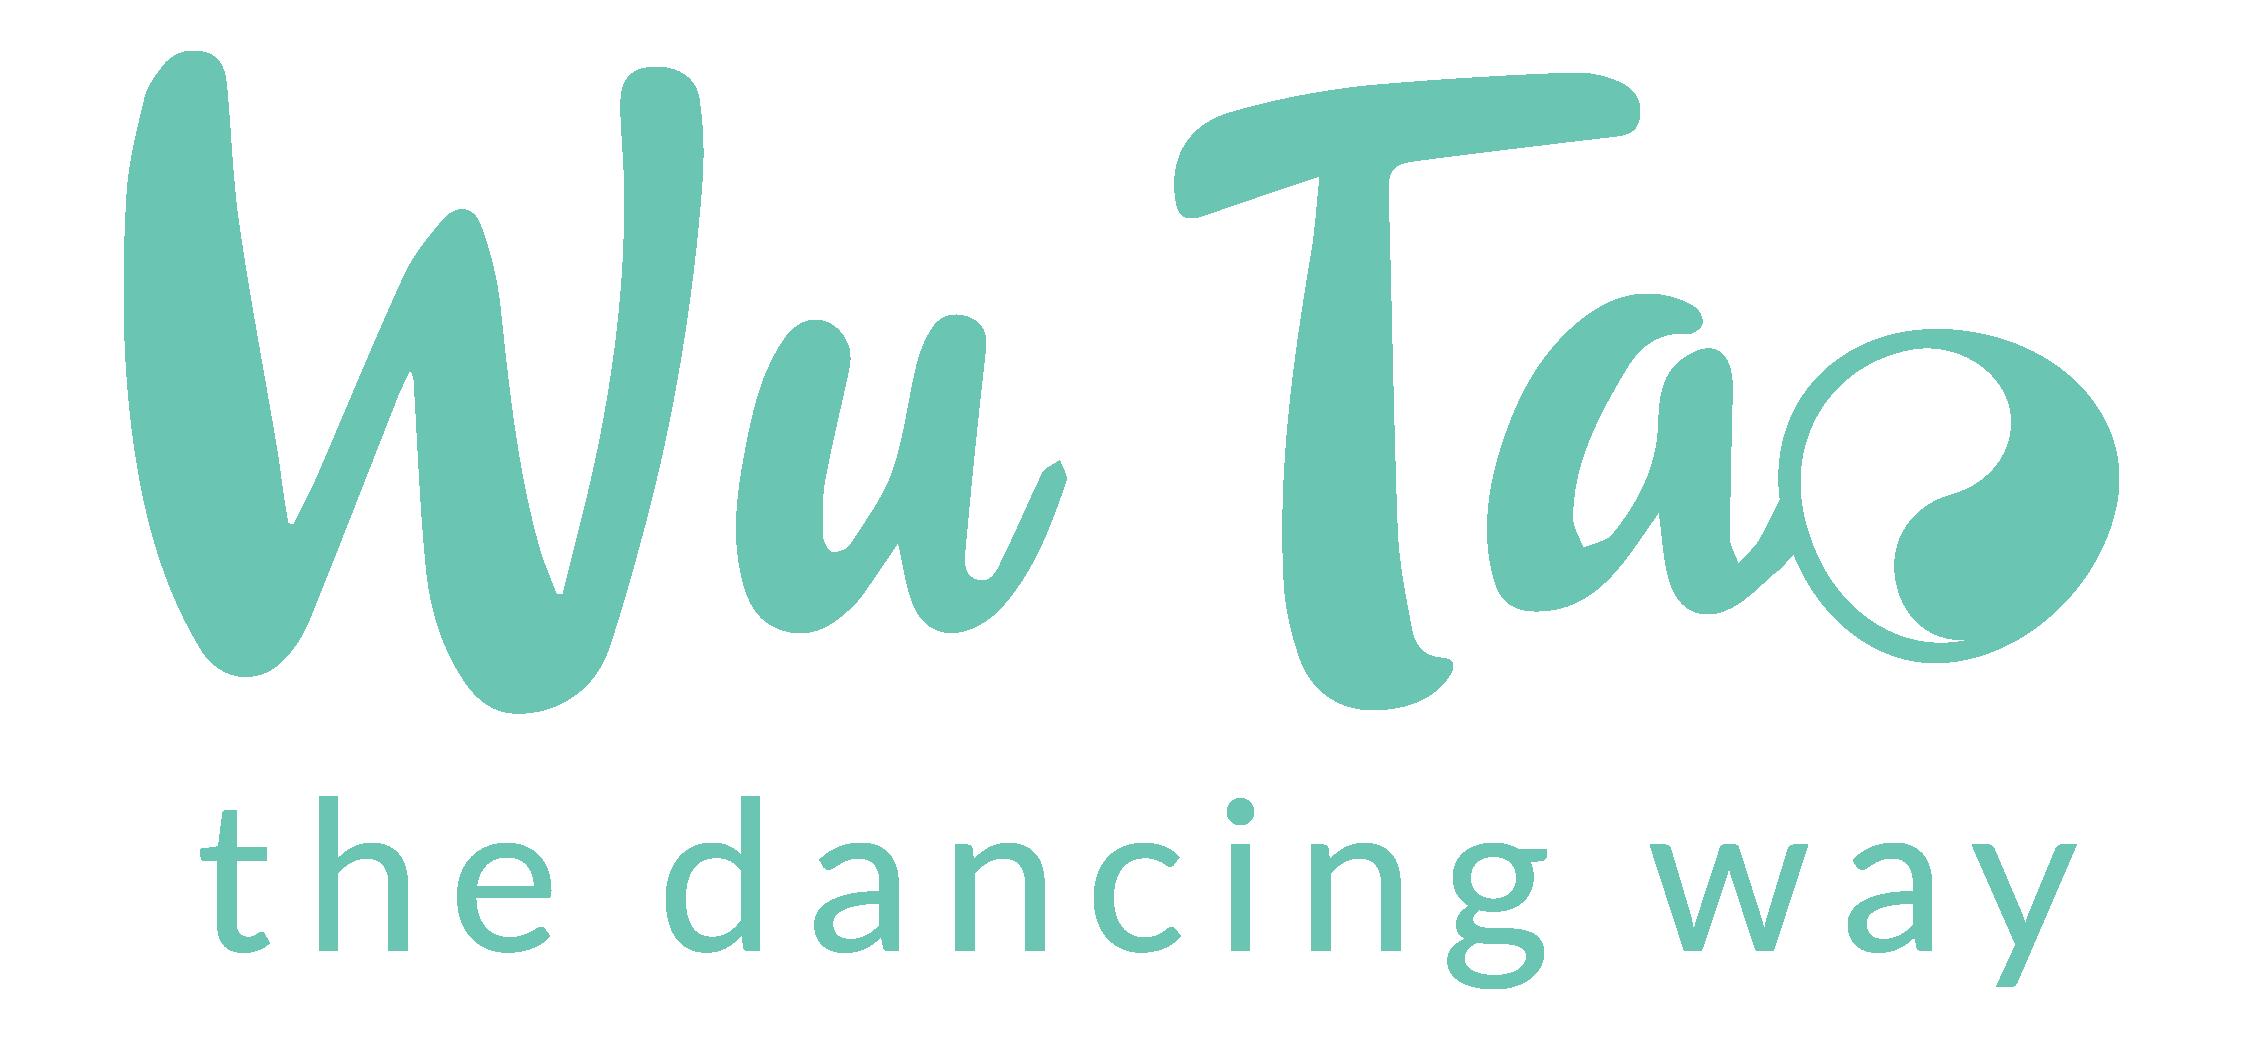 Wu Tao dance therapy logo